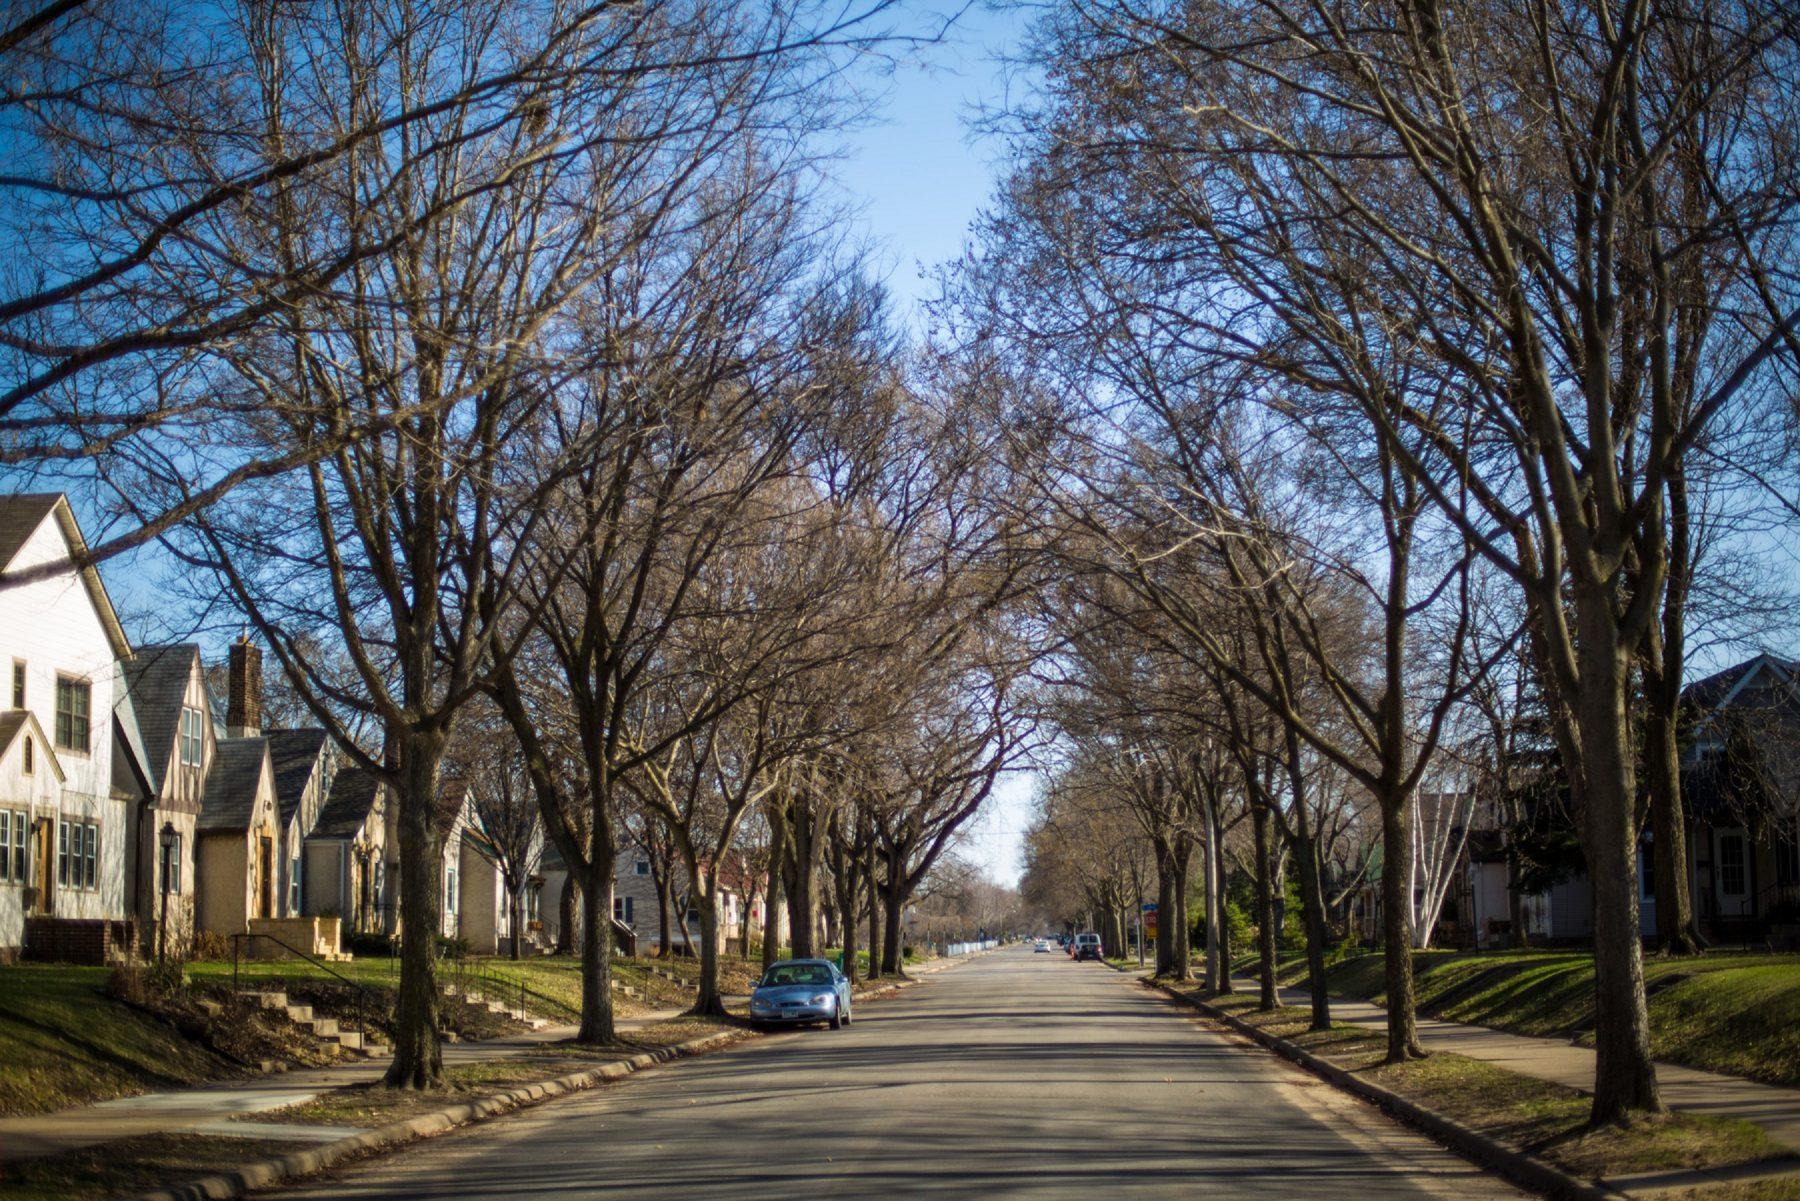 Boulevard Trees